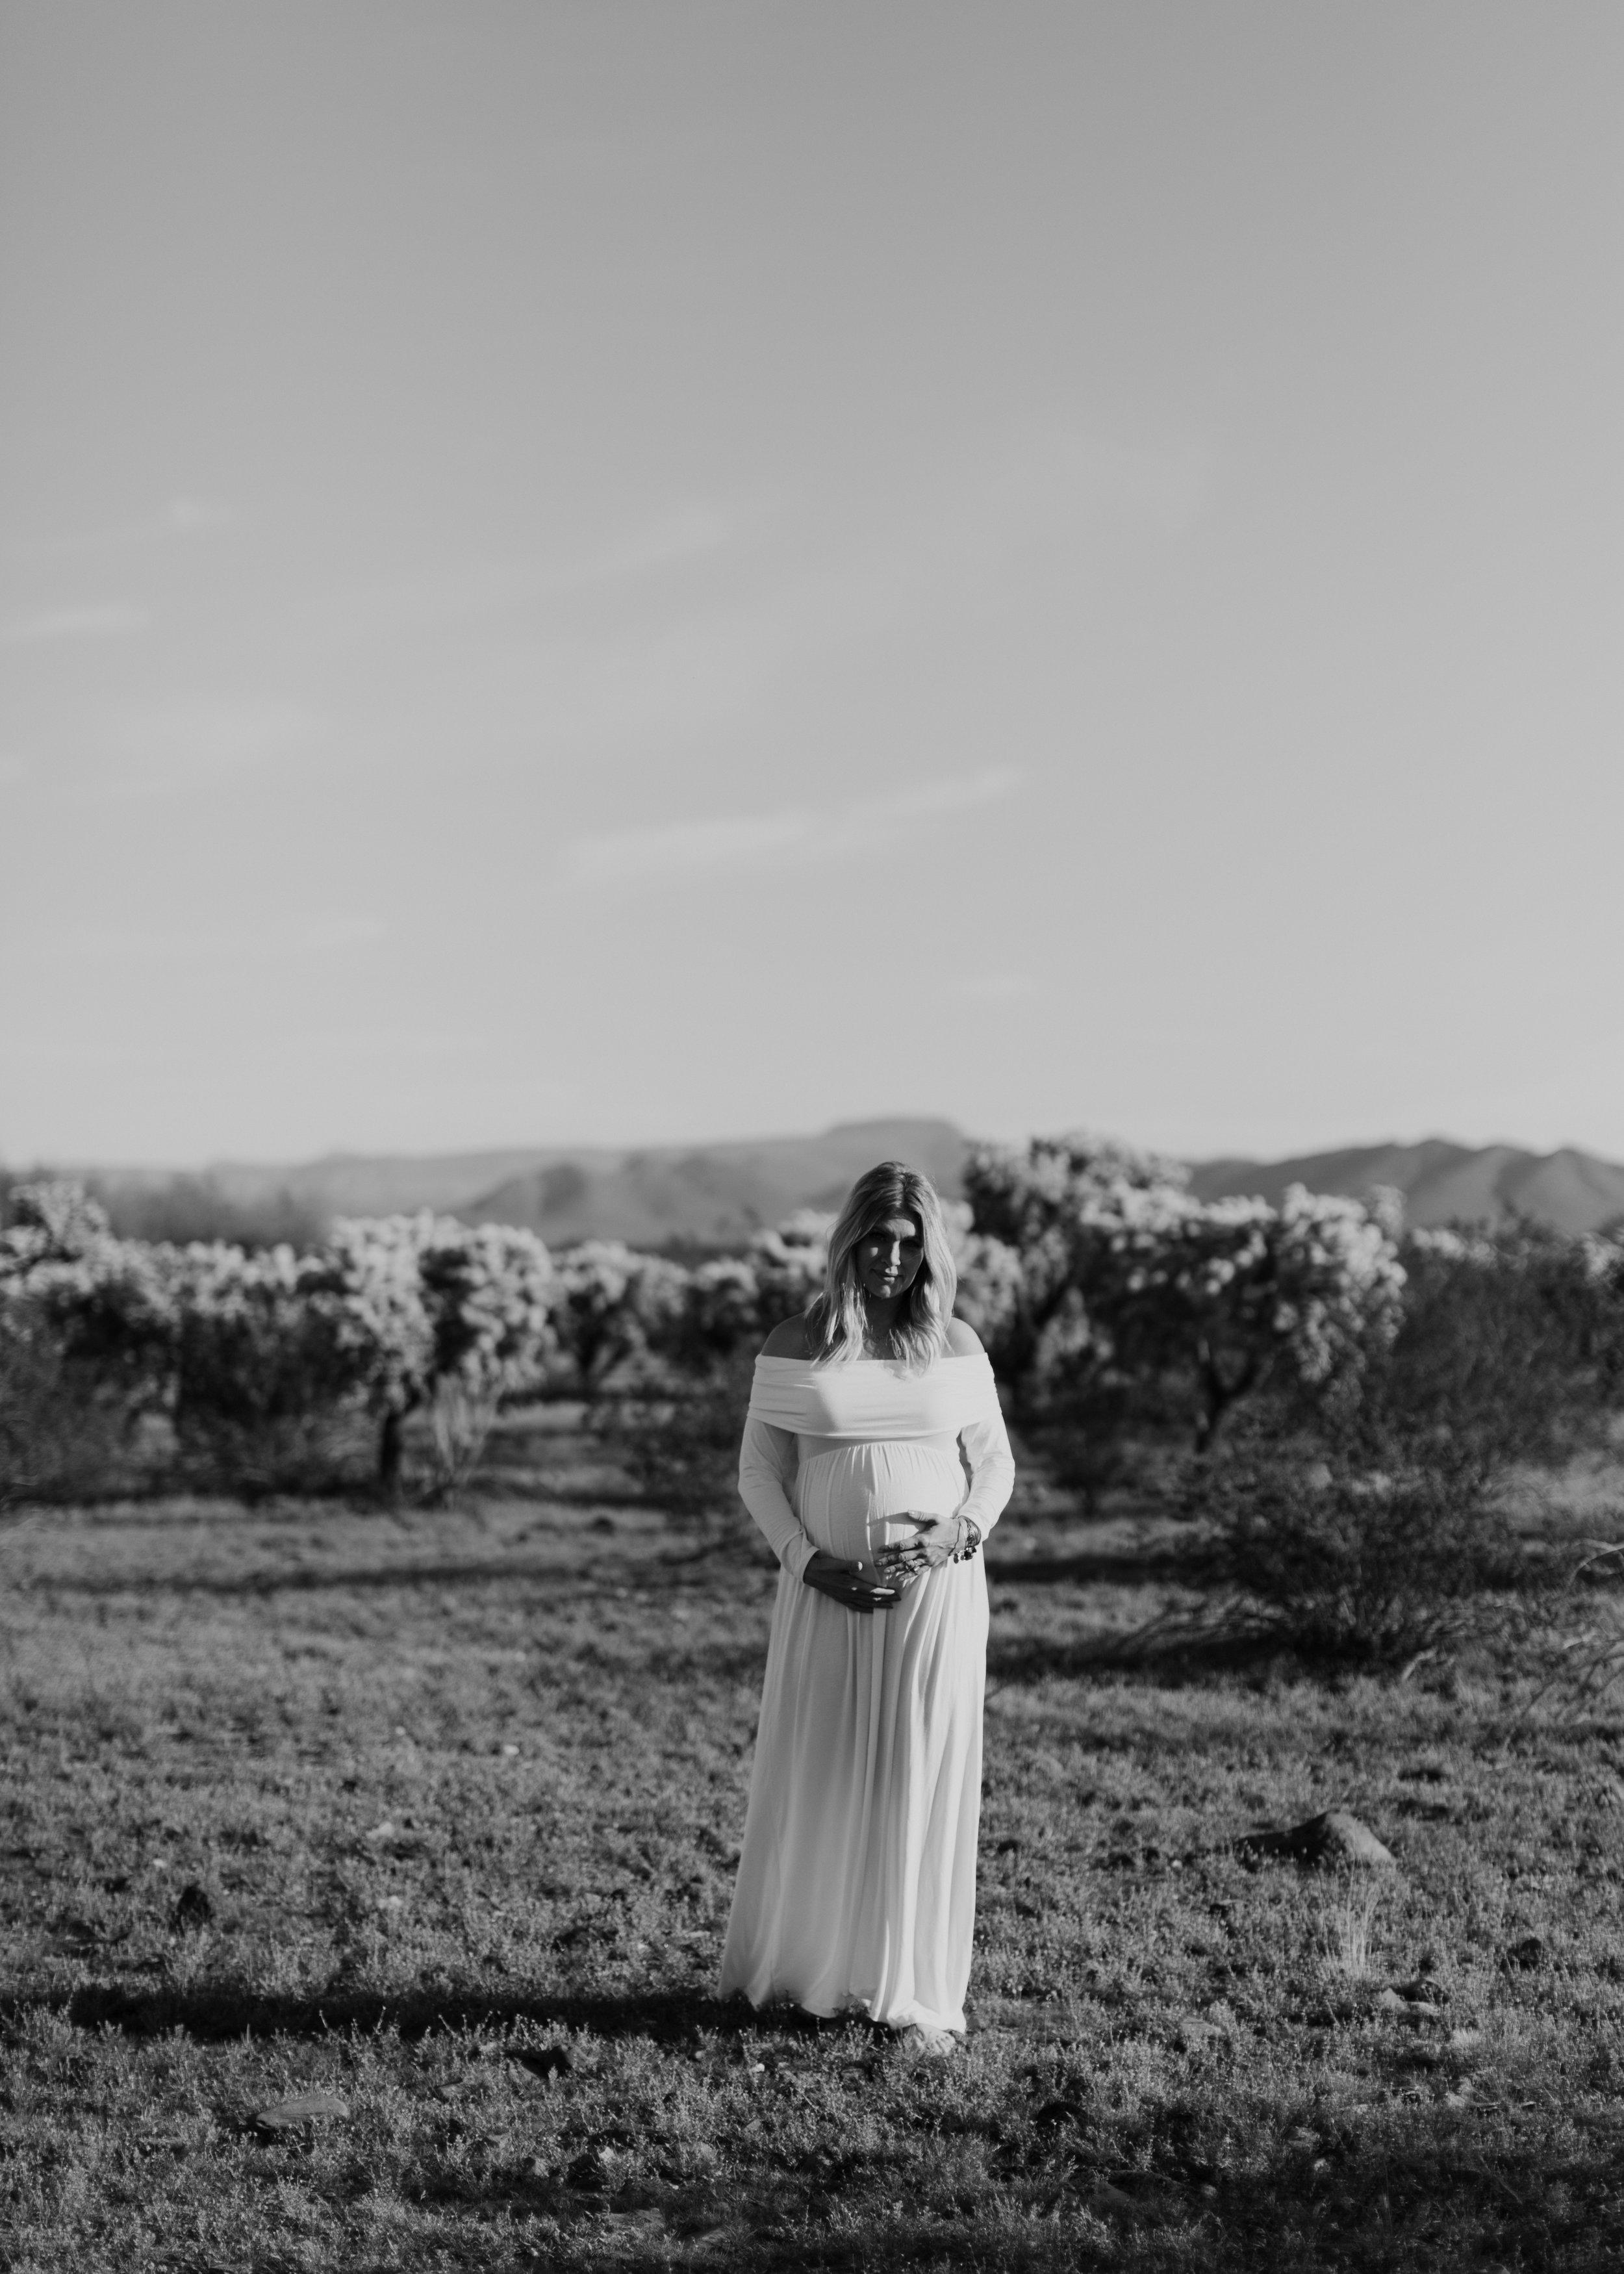 phoenix-maternity-photographer-86.jpg